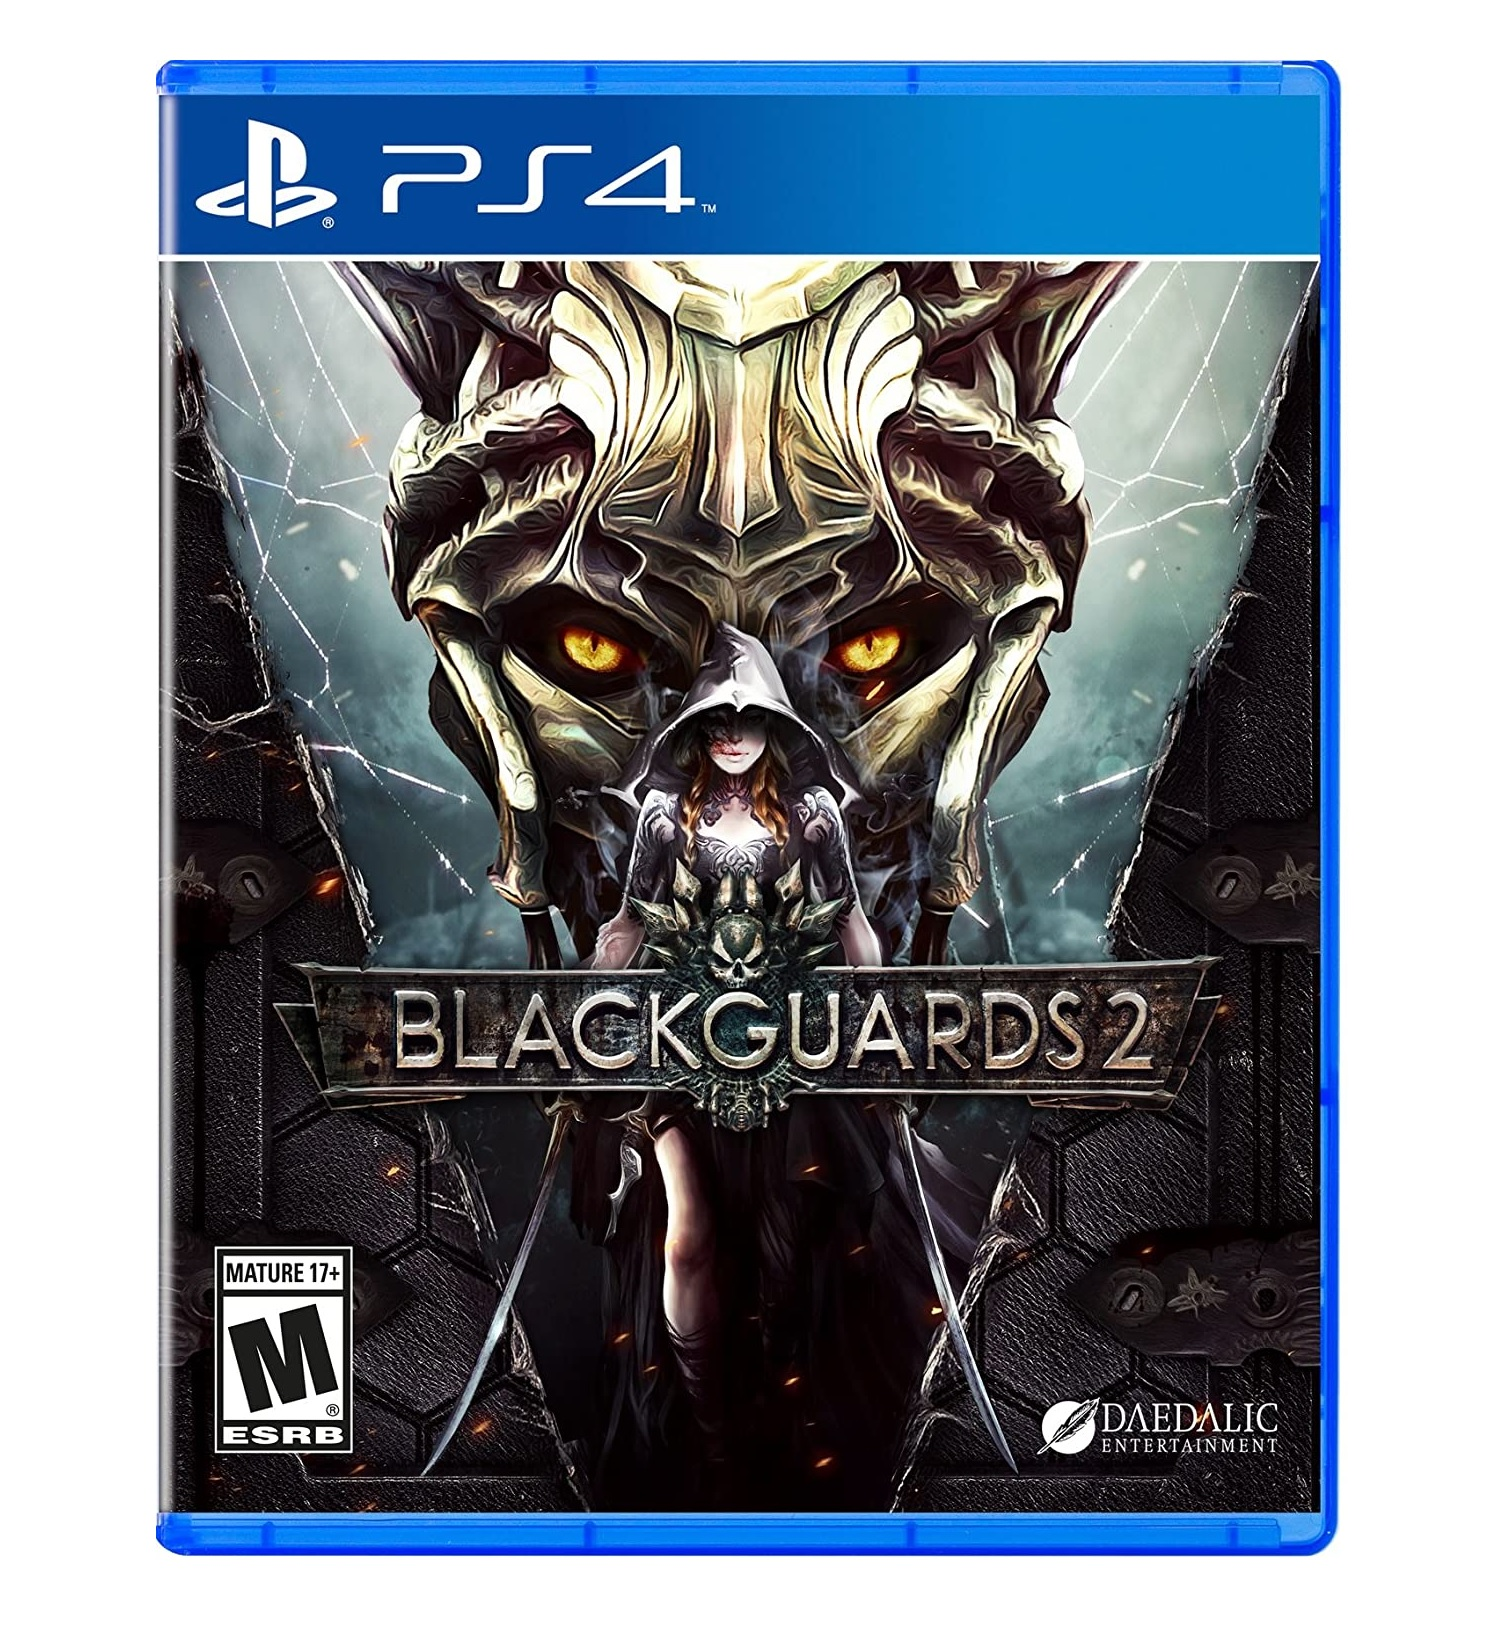 Daedalic Entertainment Blackguards 2 Refurbished PS4 Playstation 4 Game